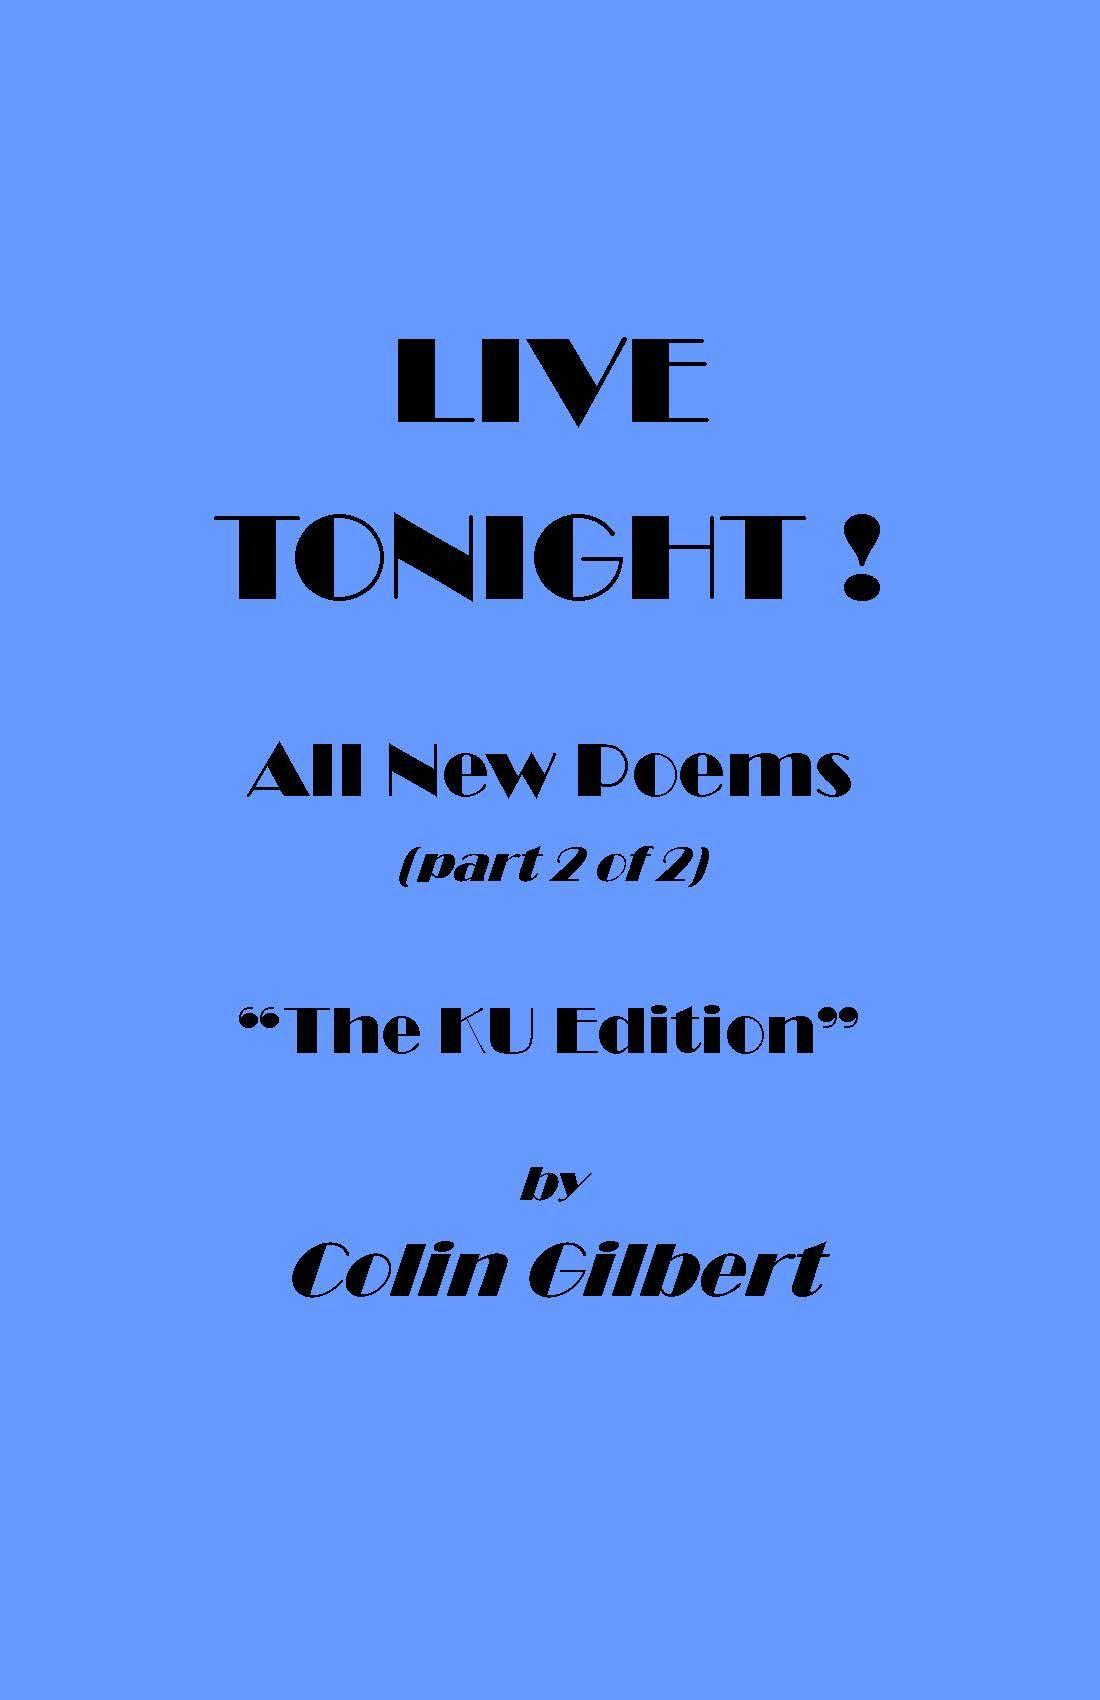 LIVE TONIGHT - The Haiku Edition